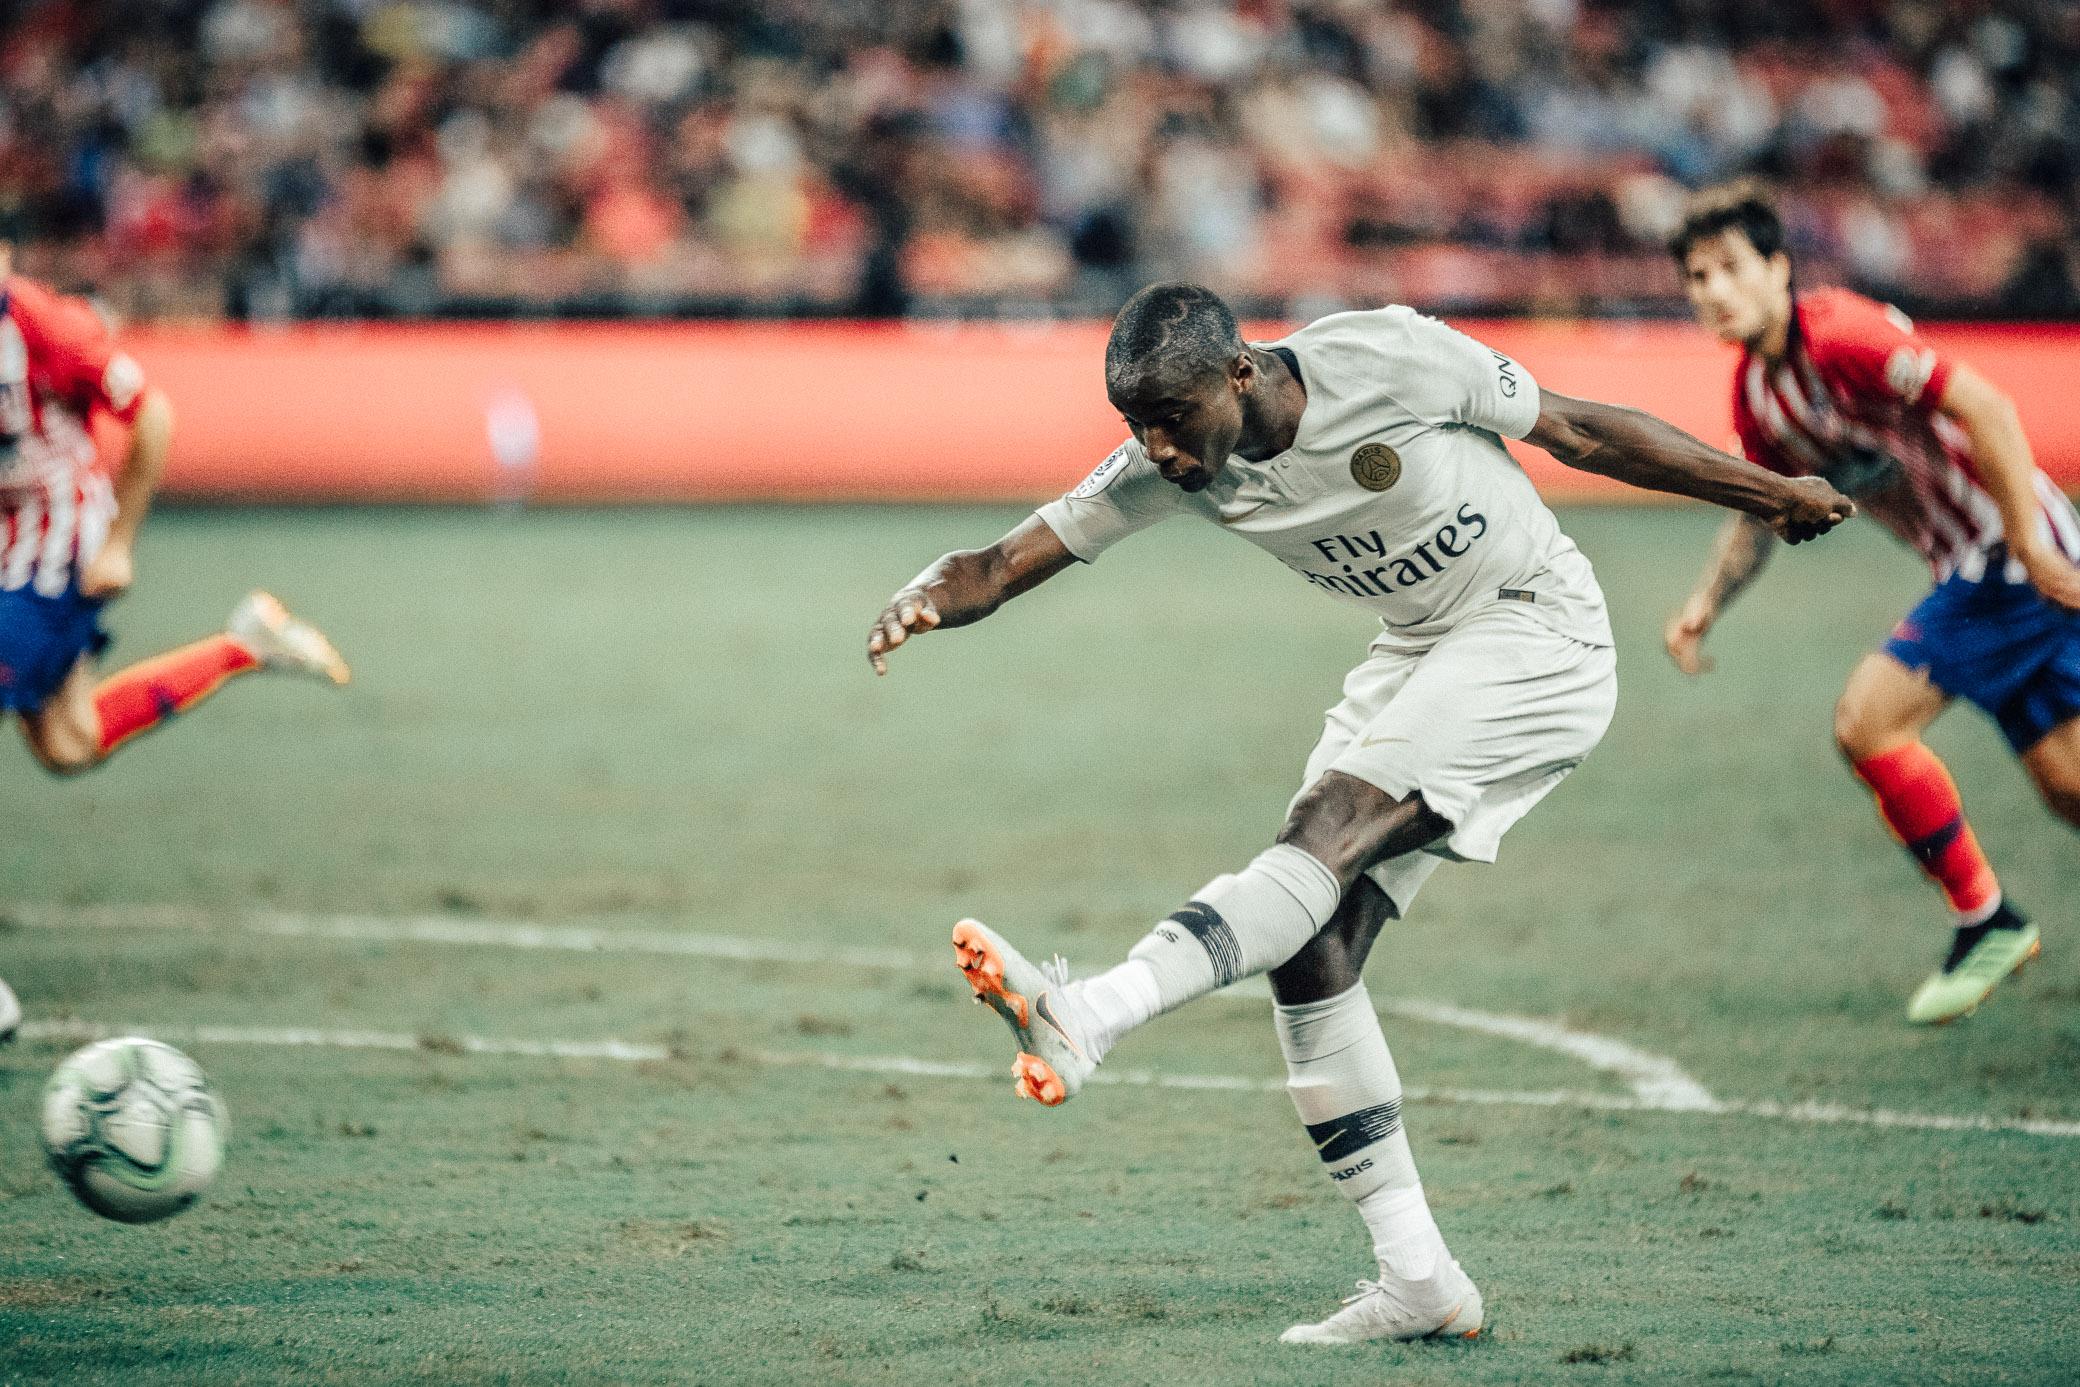 ICC 2018: PSG VS ATLETICO (MOUSSA DIABY)